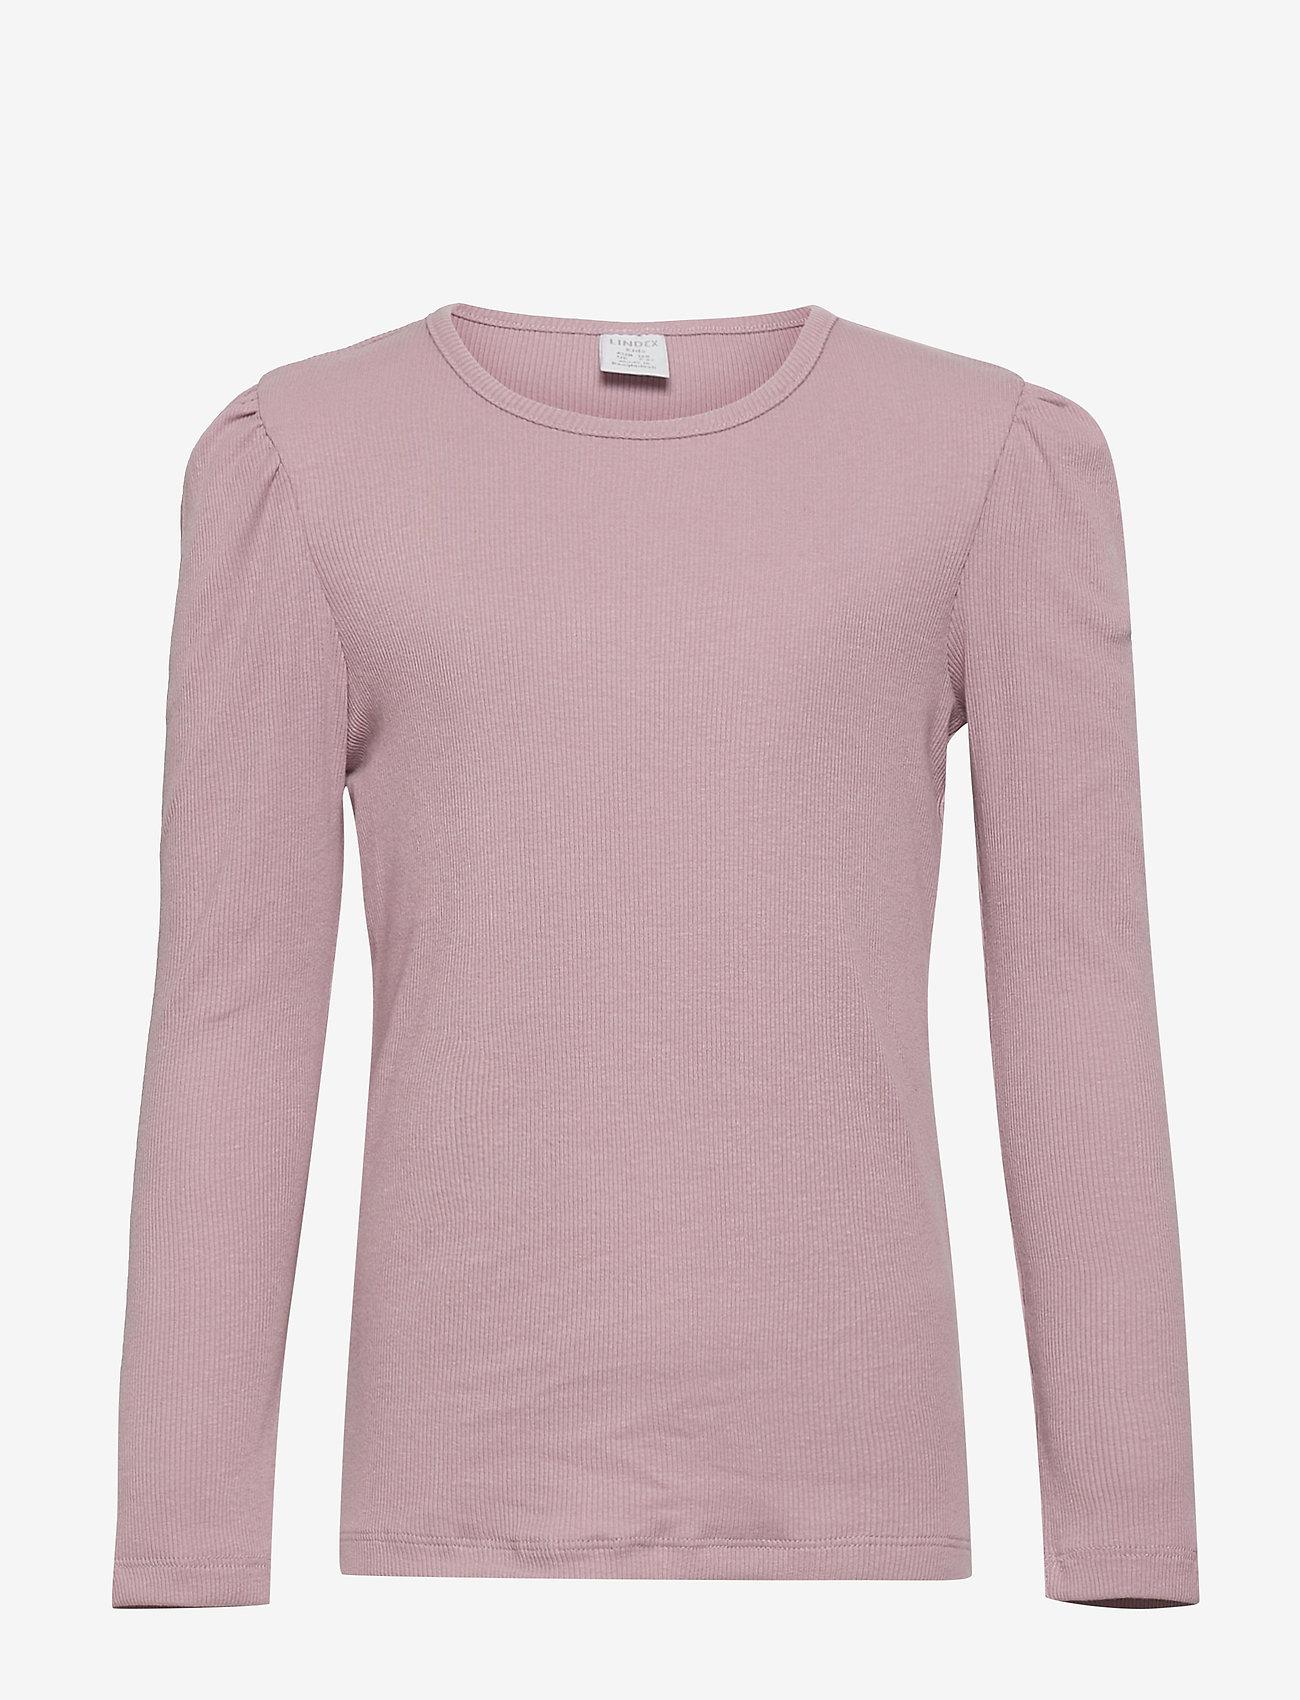 Lindex - Top rib puffsleeve - einfarbiges langarm-shirt - lilac - 0